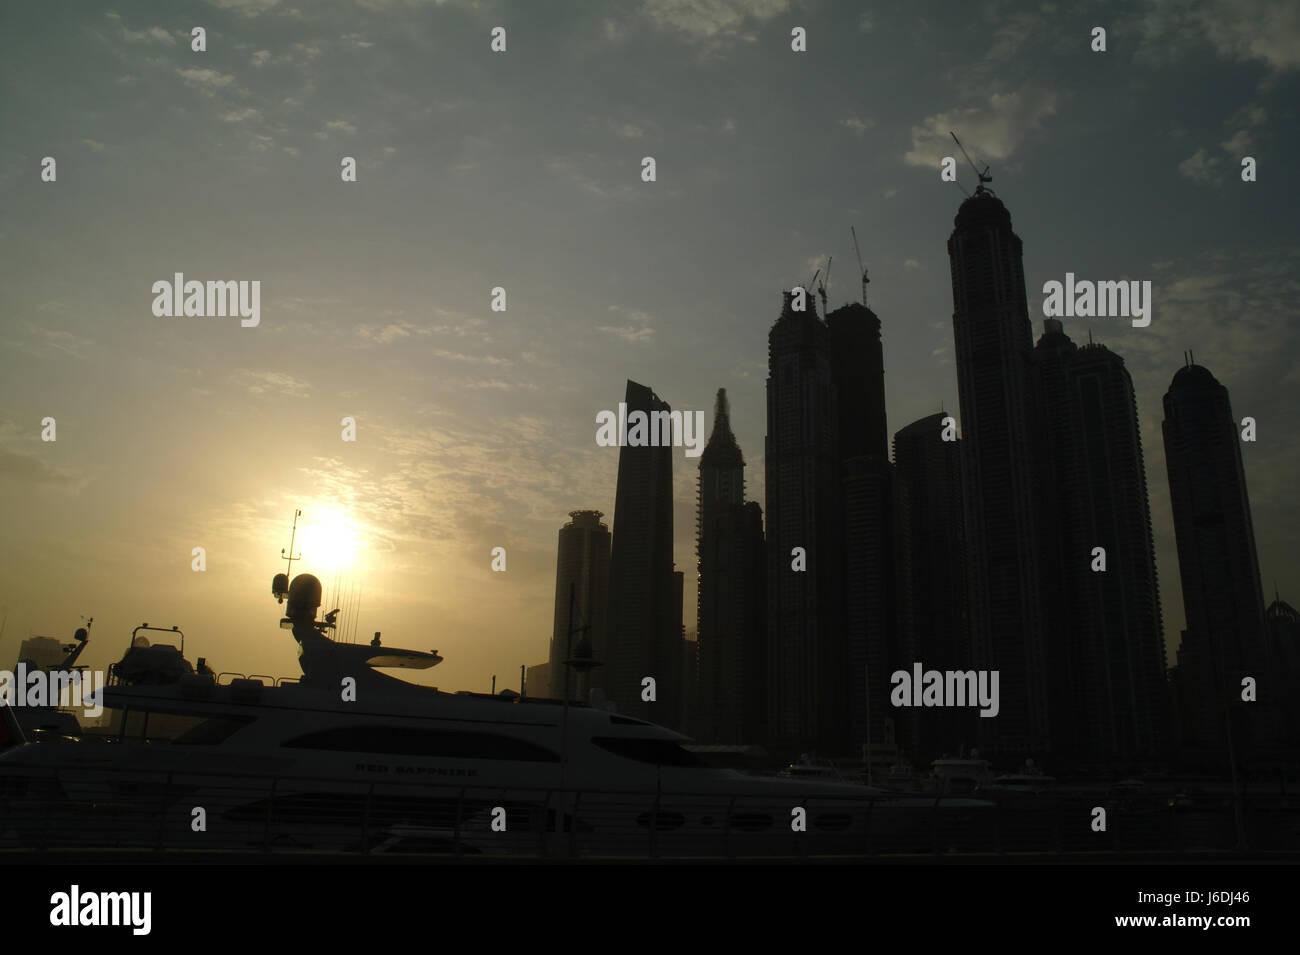 Sun rising over moored motor-cruiser towards silhouettes Dubai Marina Towers, Al Sufouh Road, Dubai International - Stock Image